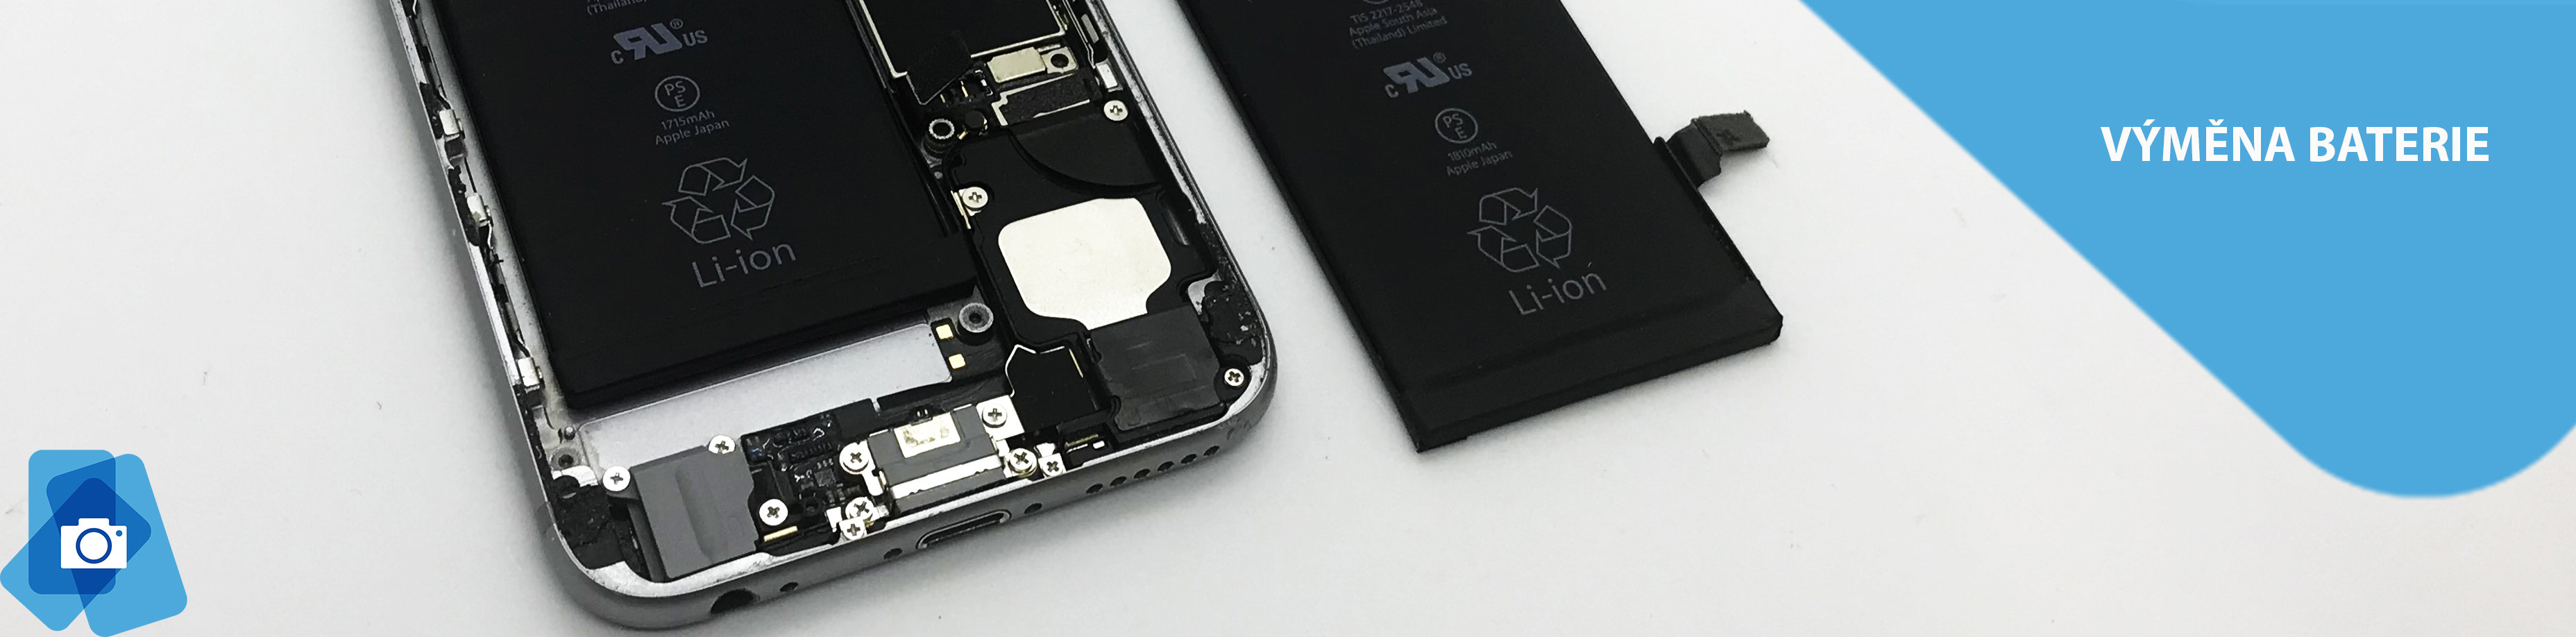 Výměna Baterie iPhone Praha